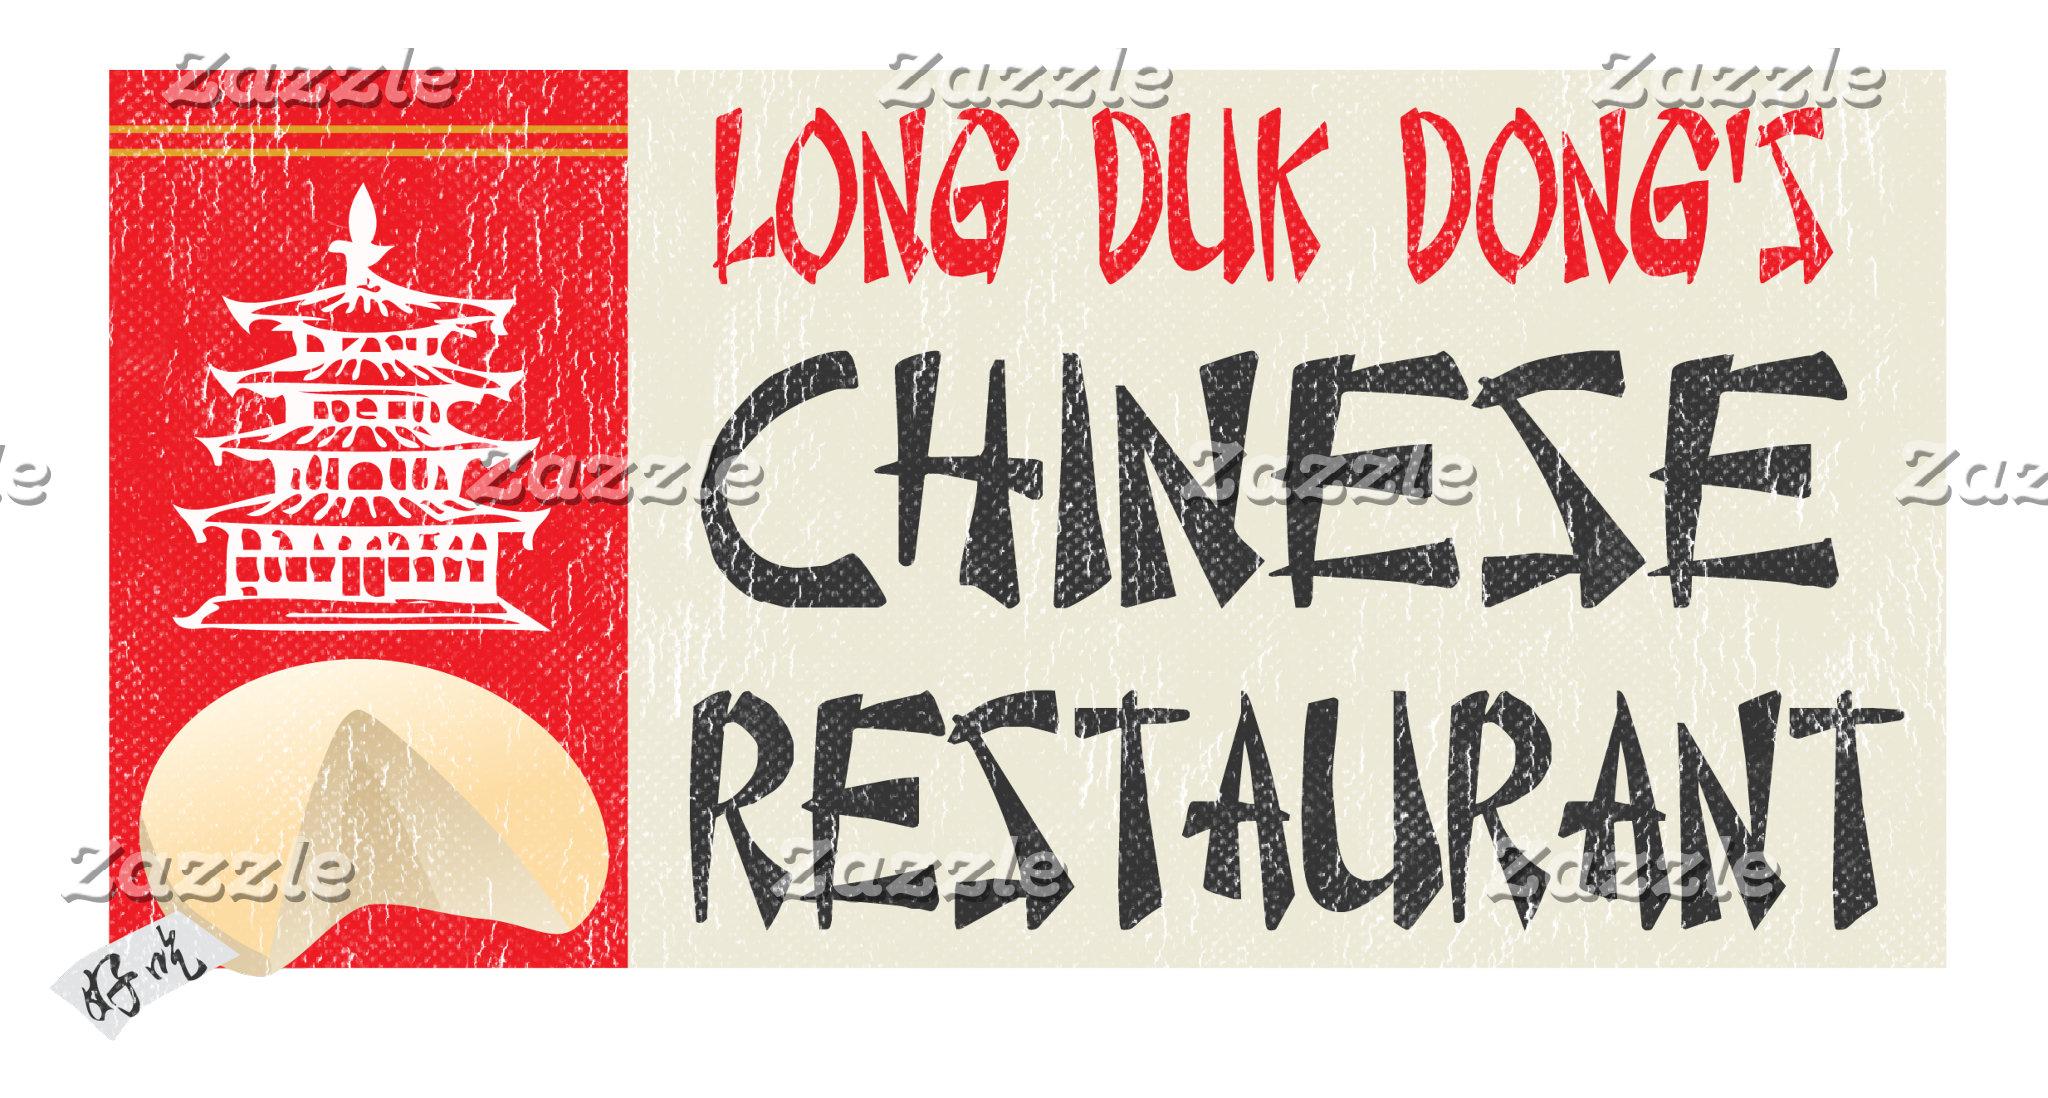 Long Duk Dong's Chinese Restaurant